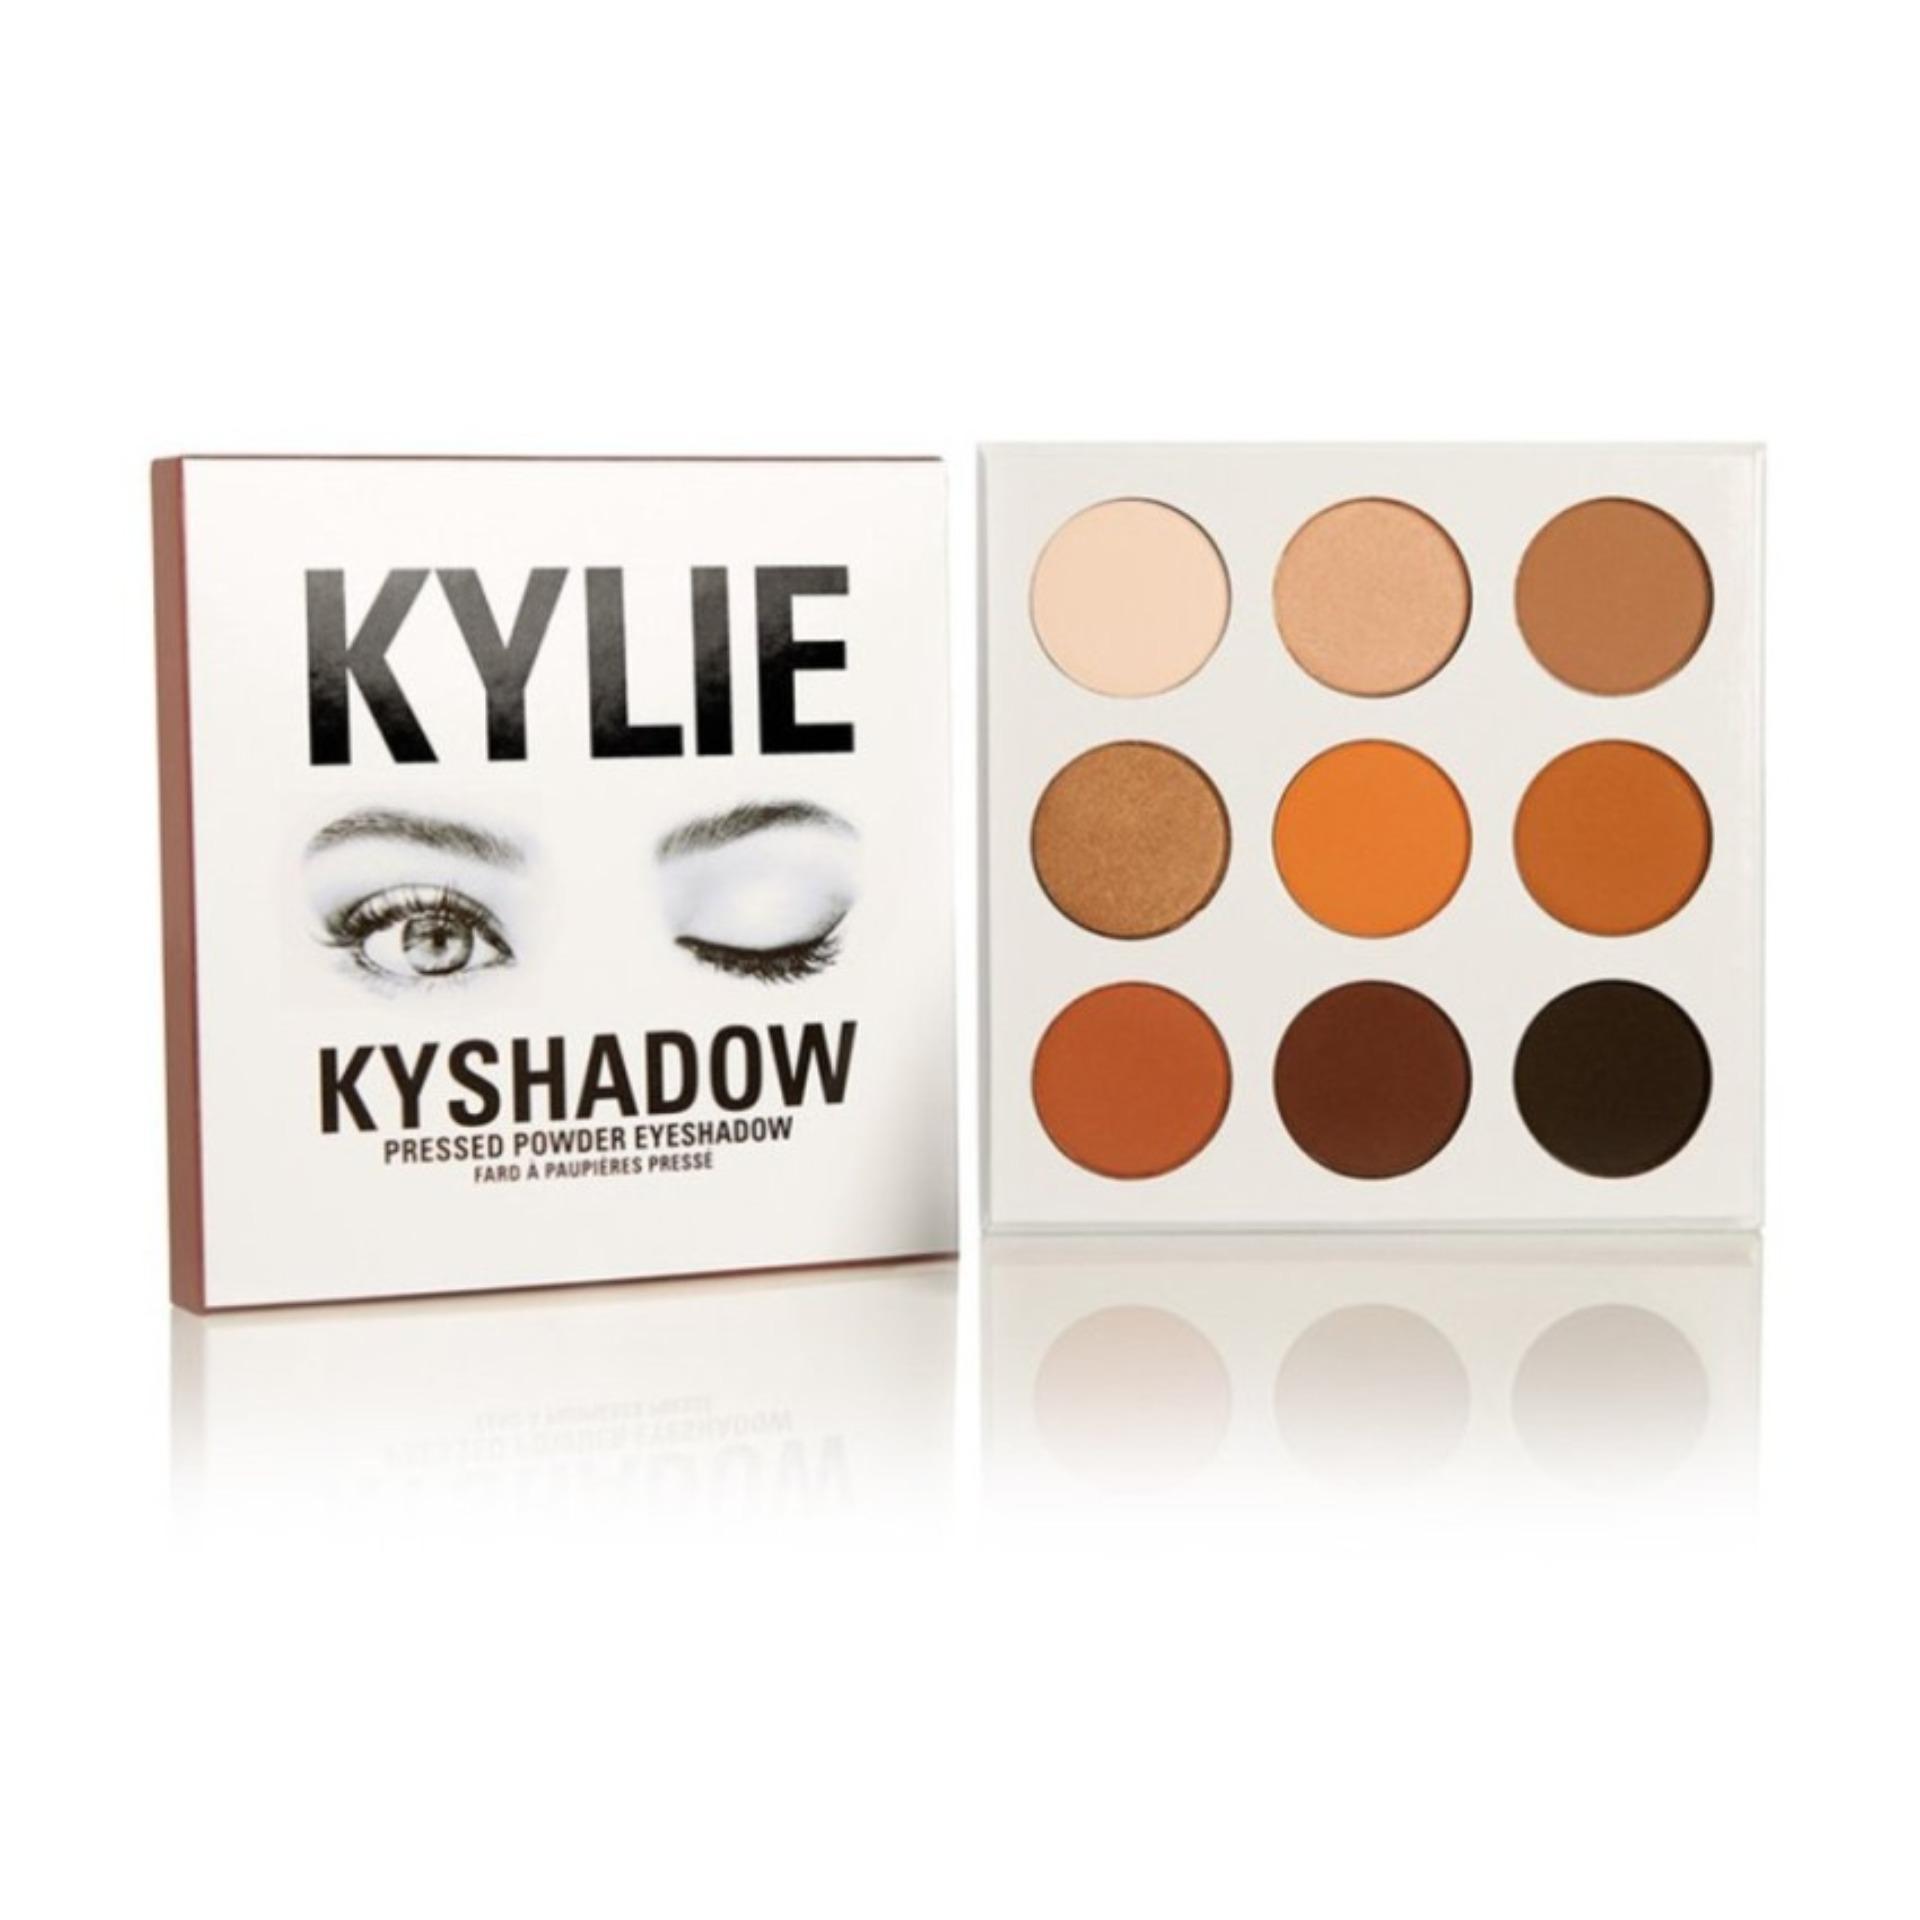 Kylie kyshadow press powder Eyeshadow Palette อายชาโดว์เนื้อฝุ่นสวยติดทนนาน เนื้อด้านสวย